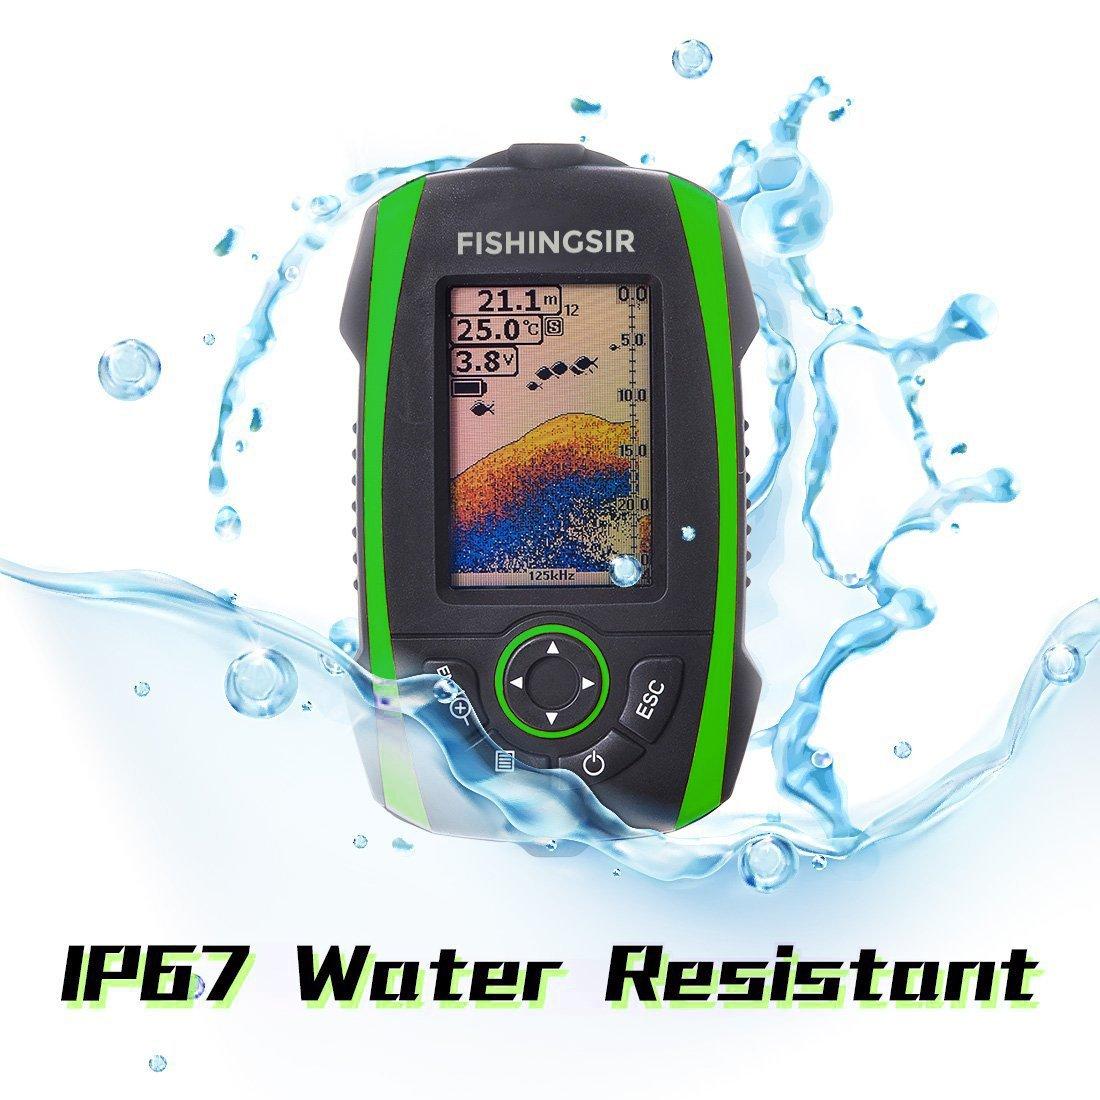 FISHINGSIR Wireless Portable Fishfinder with Sonar Sensor